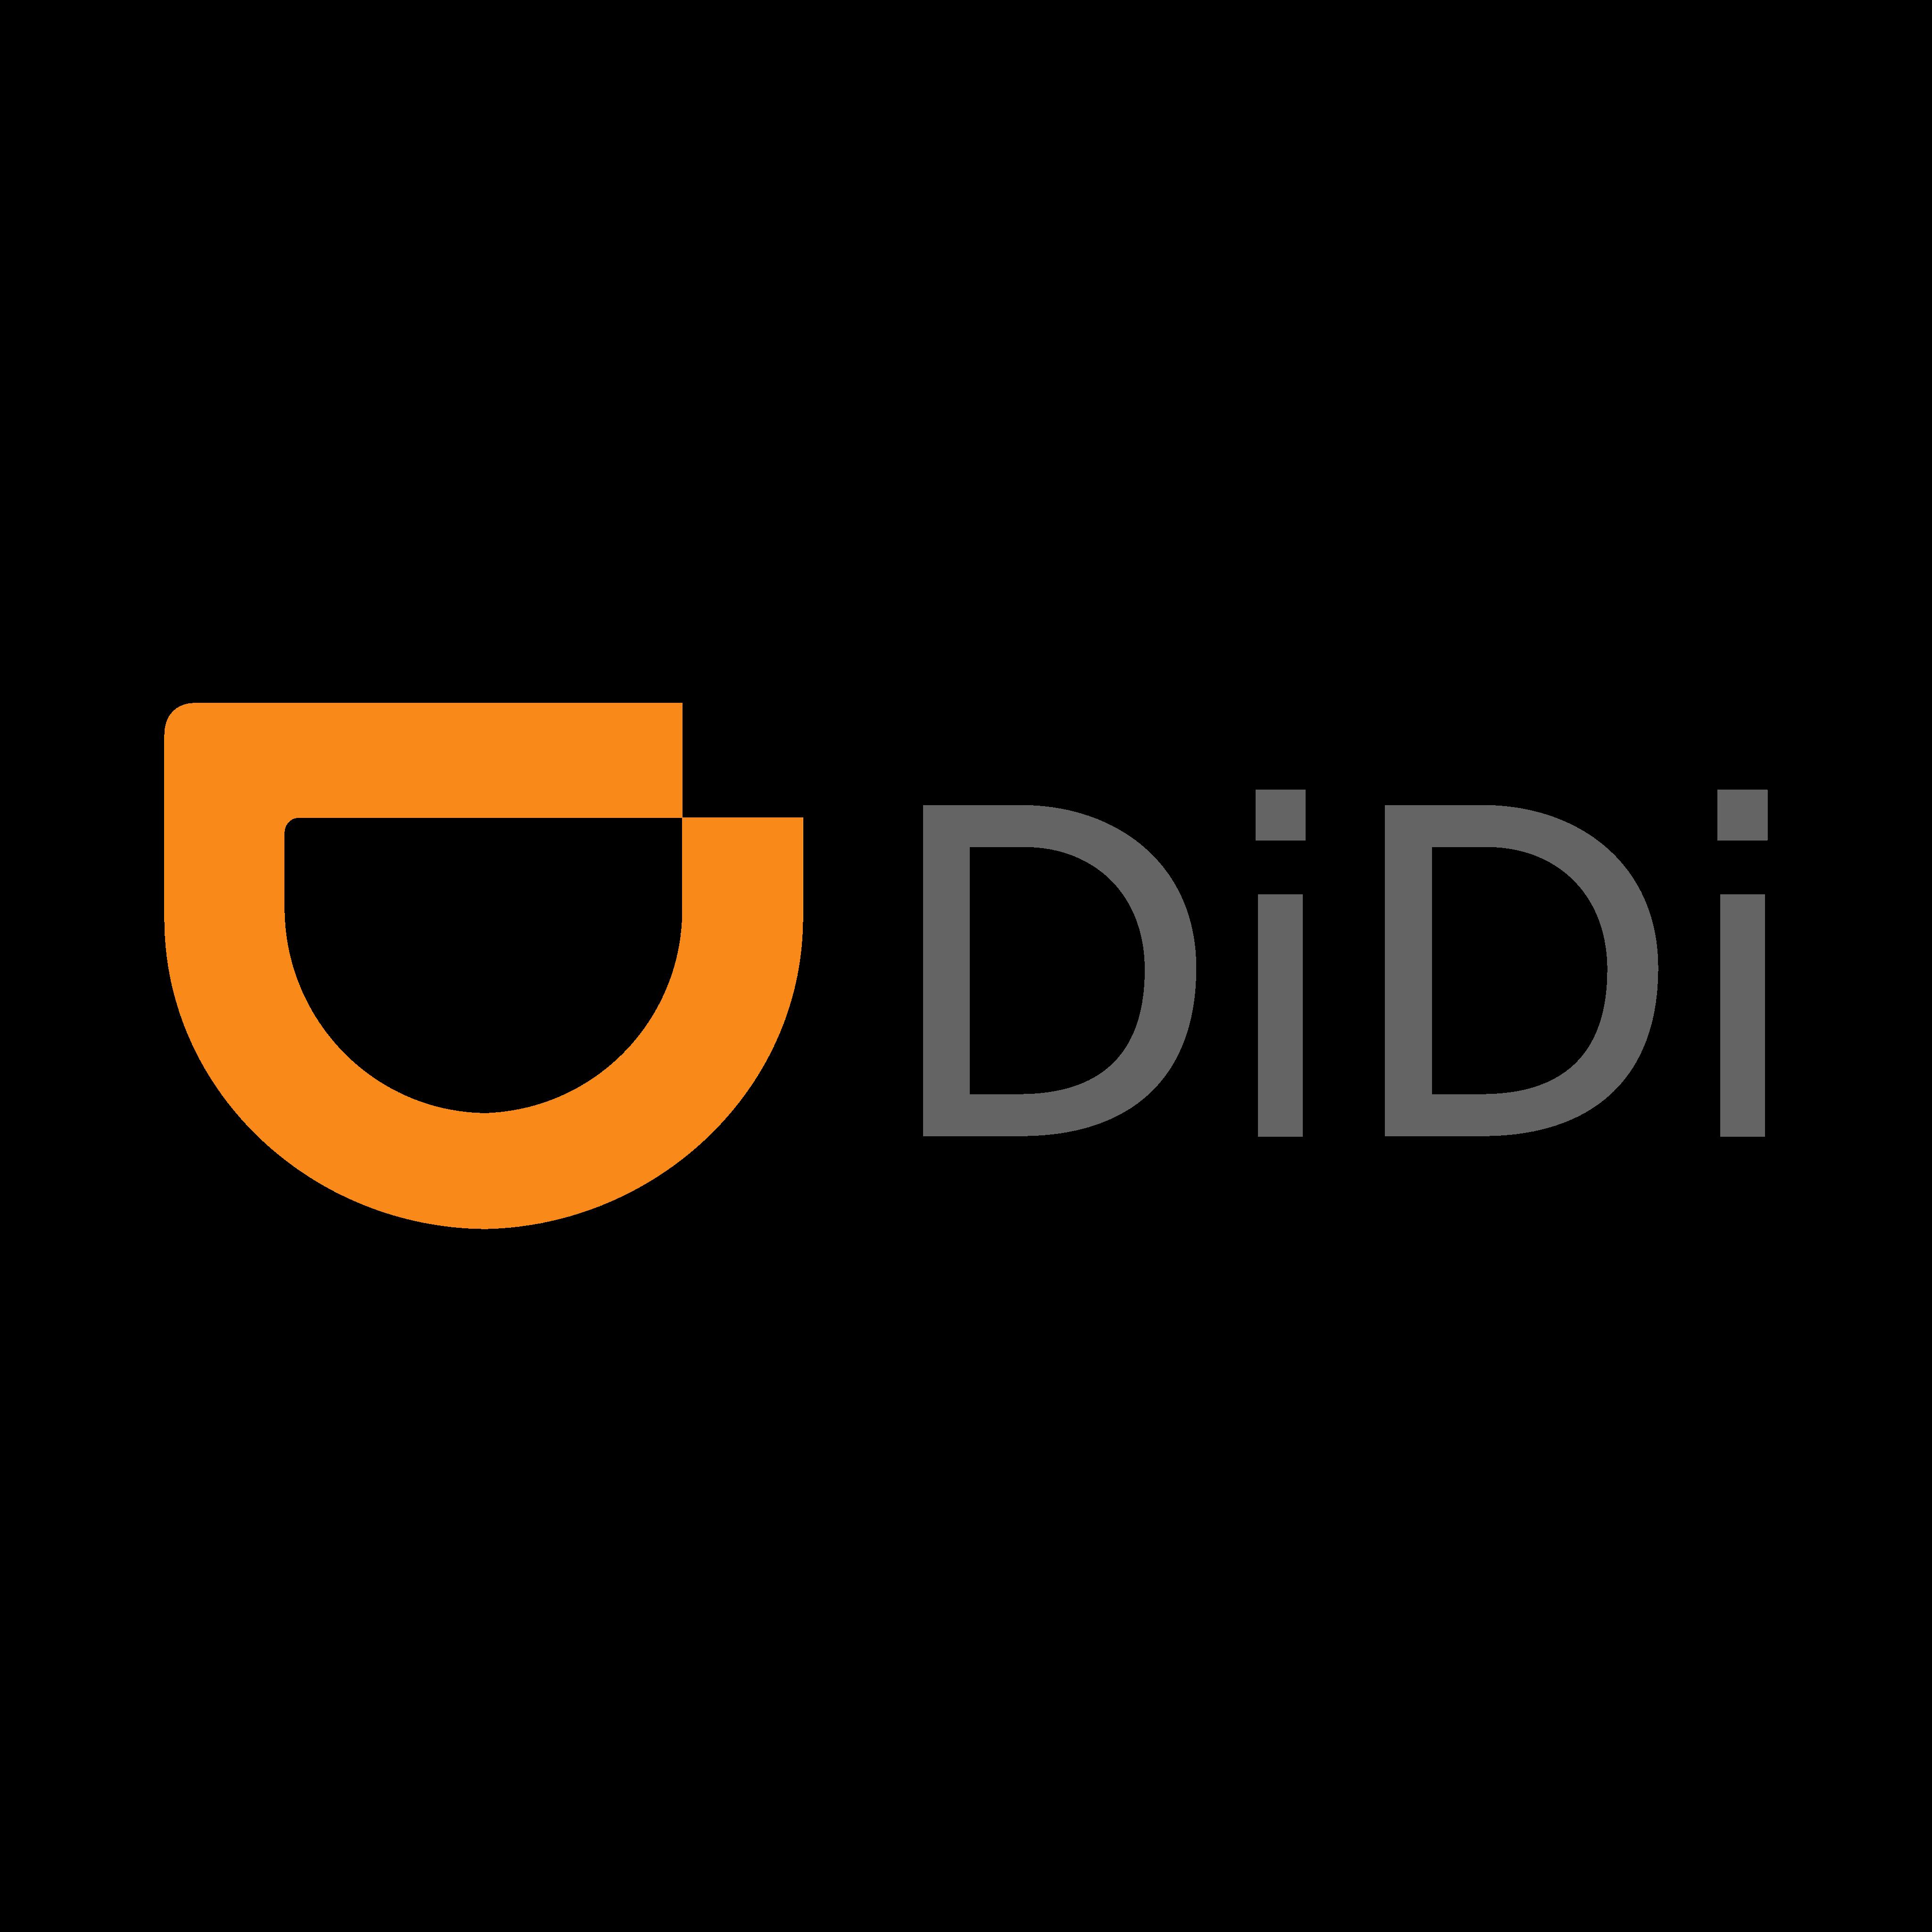 didi logo 0 - Didi Logo